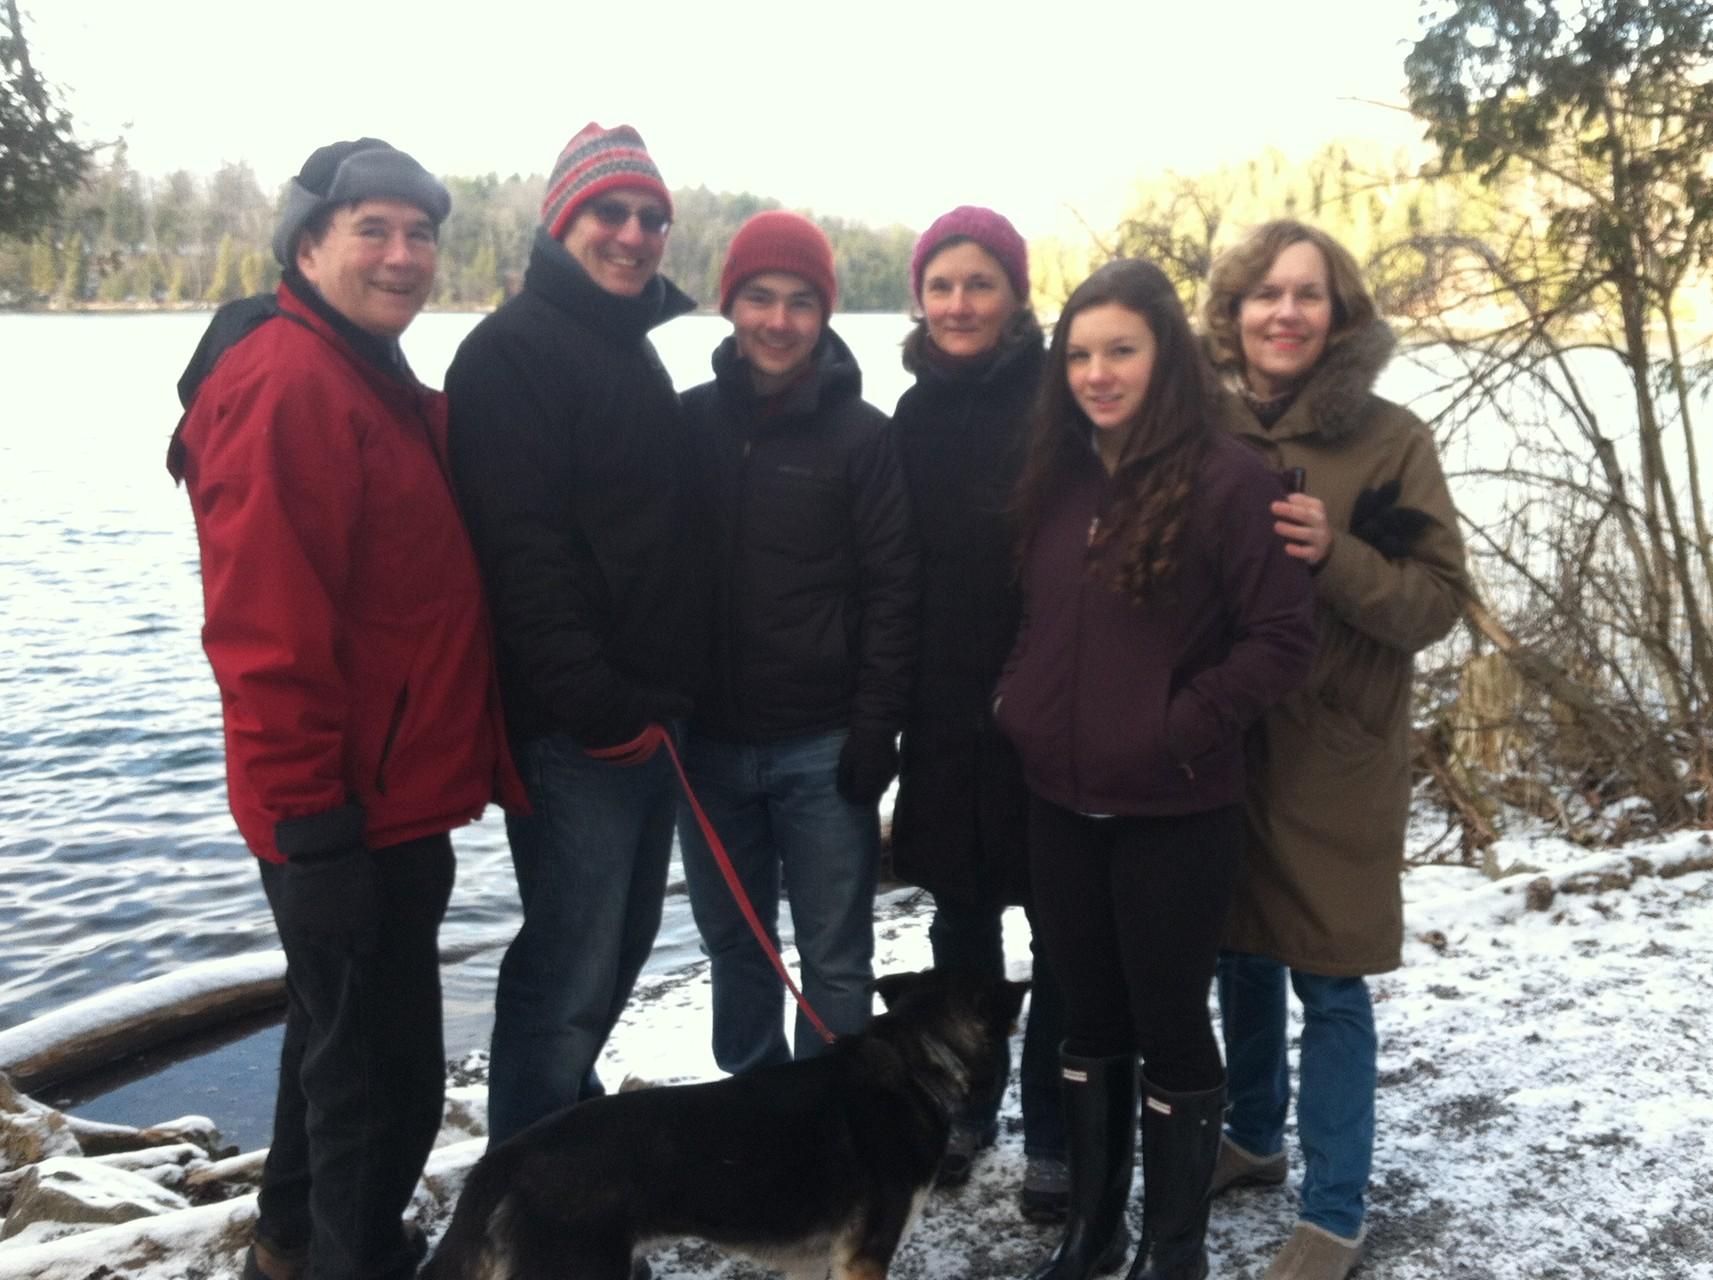 Green Lakes, Dec. 30, 2014  John, Nick, Trevan, Cyndi, & Sara Signorelli, Lorraine